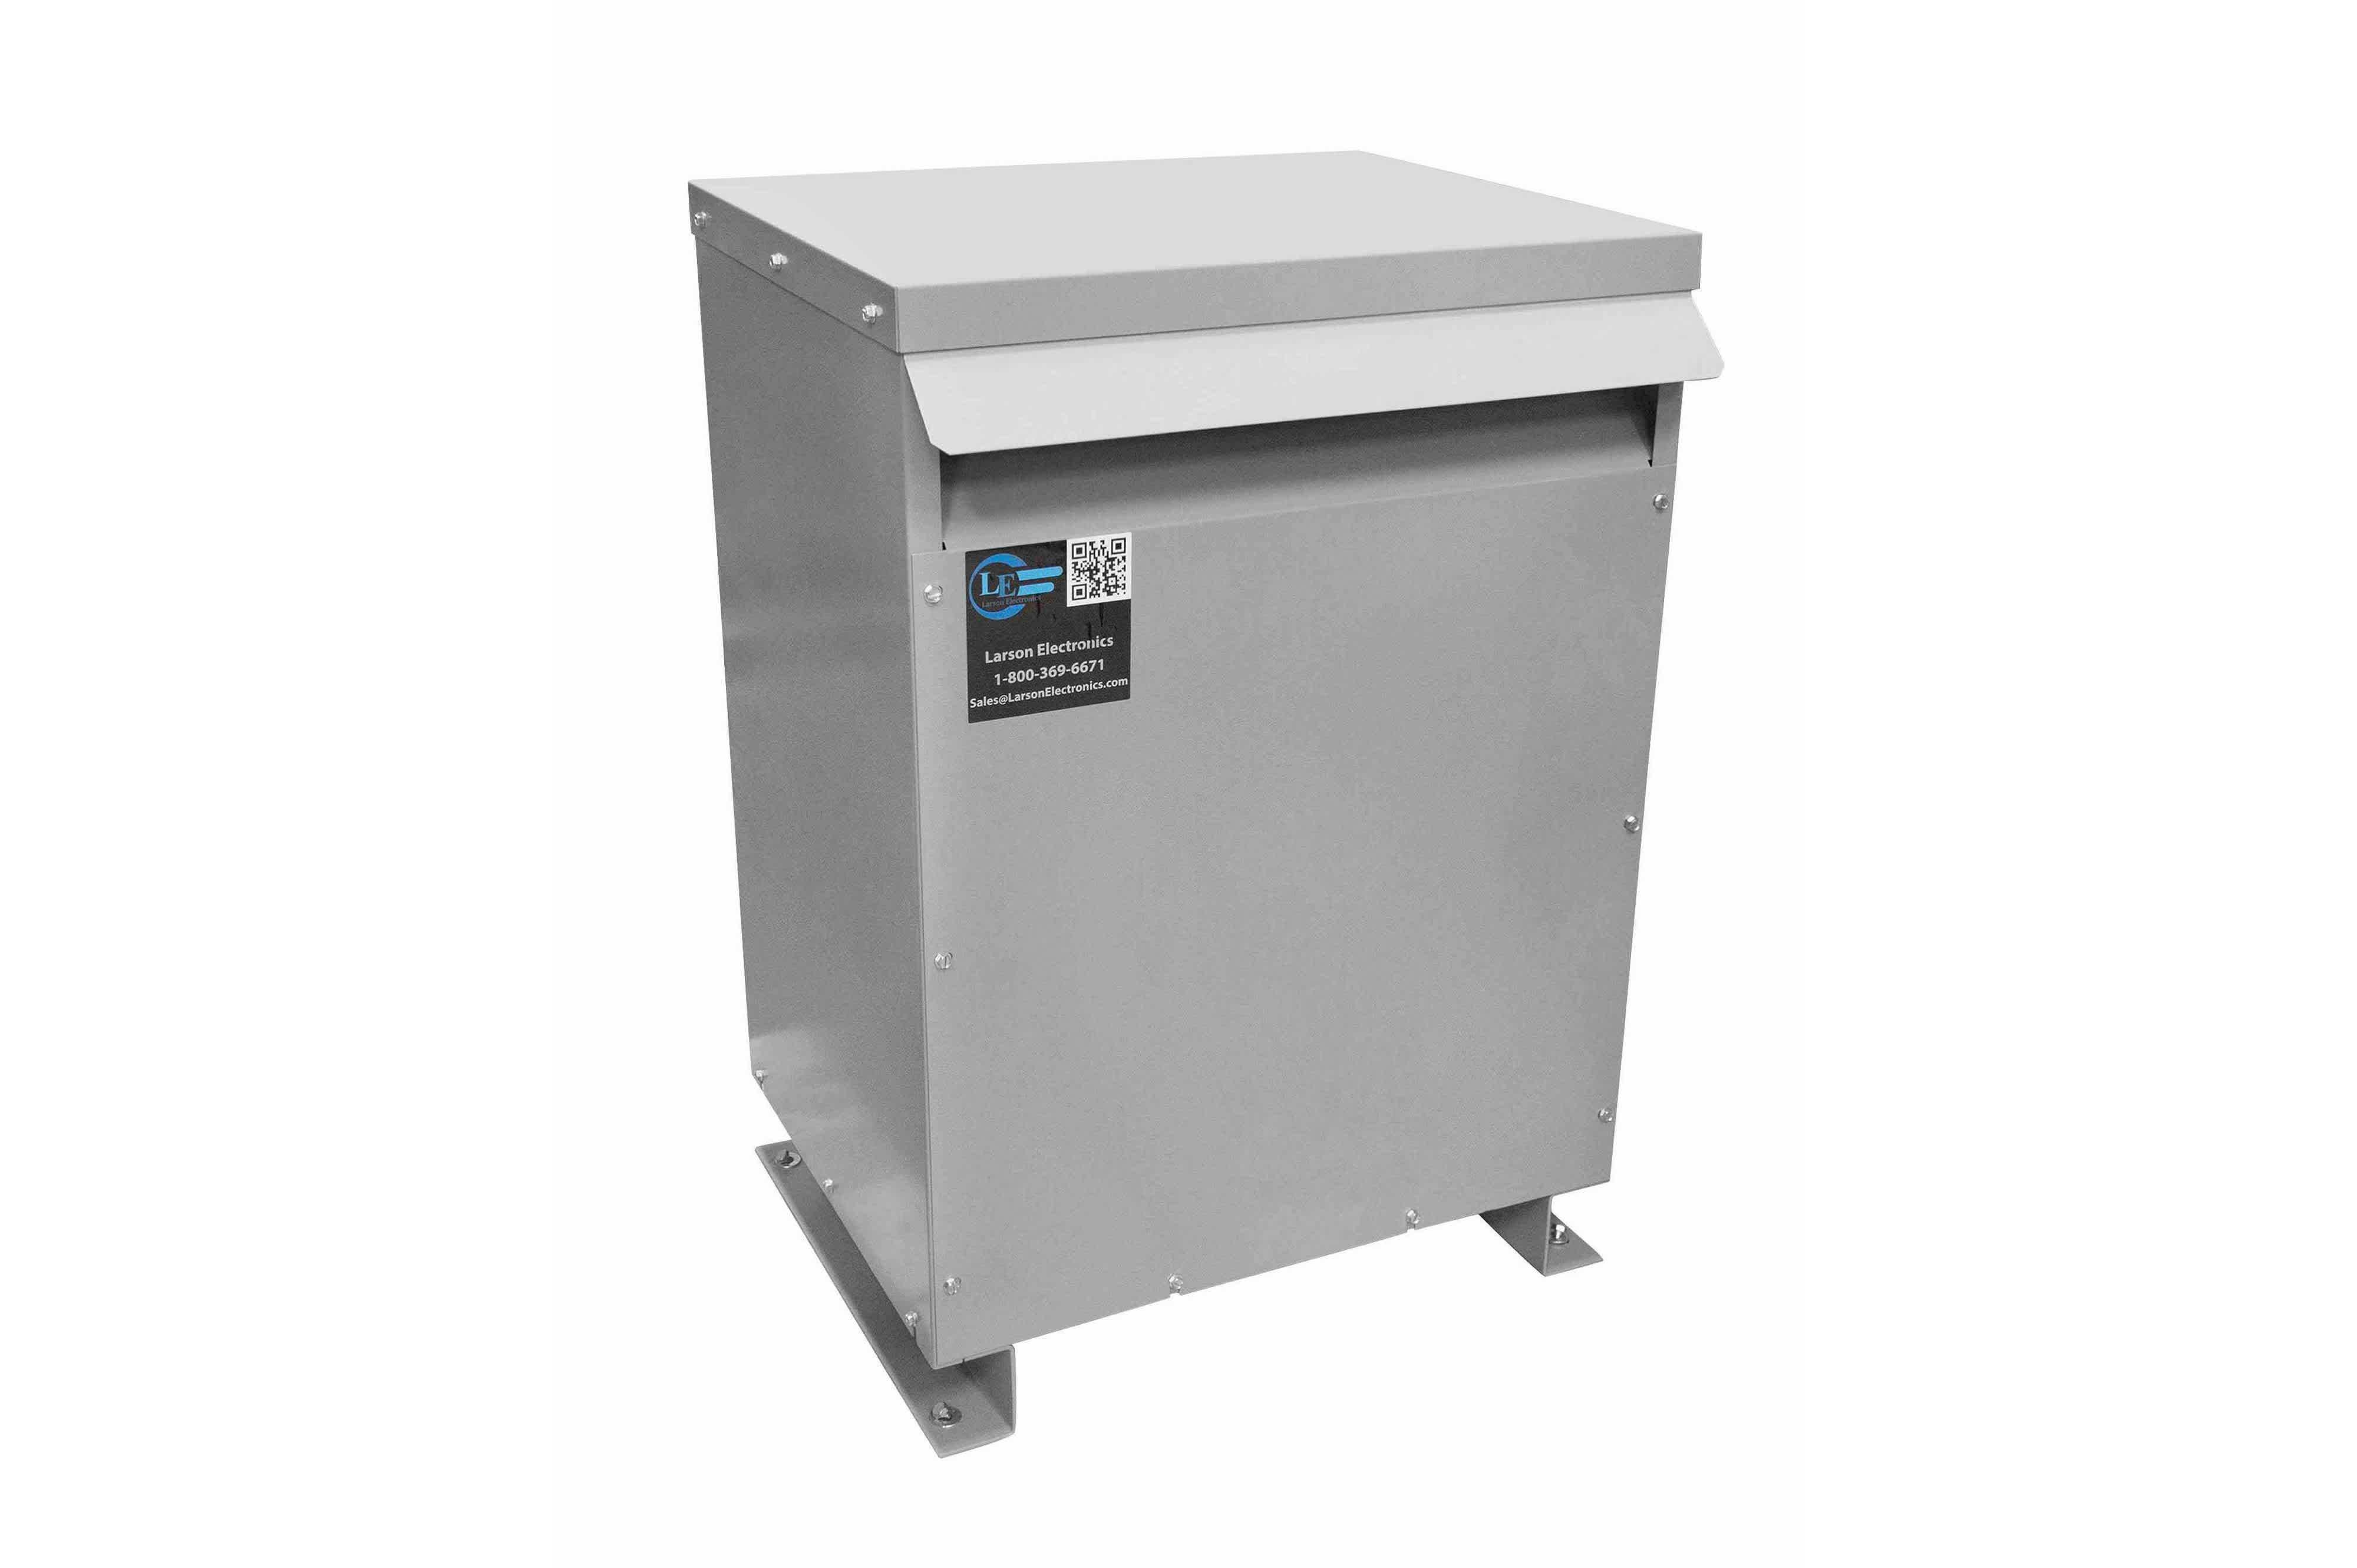 110 kVA 3PH Isolation Transformer, 208V Wye Primary, 415Y/240 Wye-N Secondary, N3R, Ventilated, 60 Hz